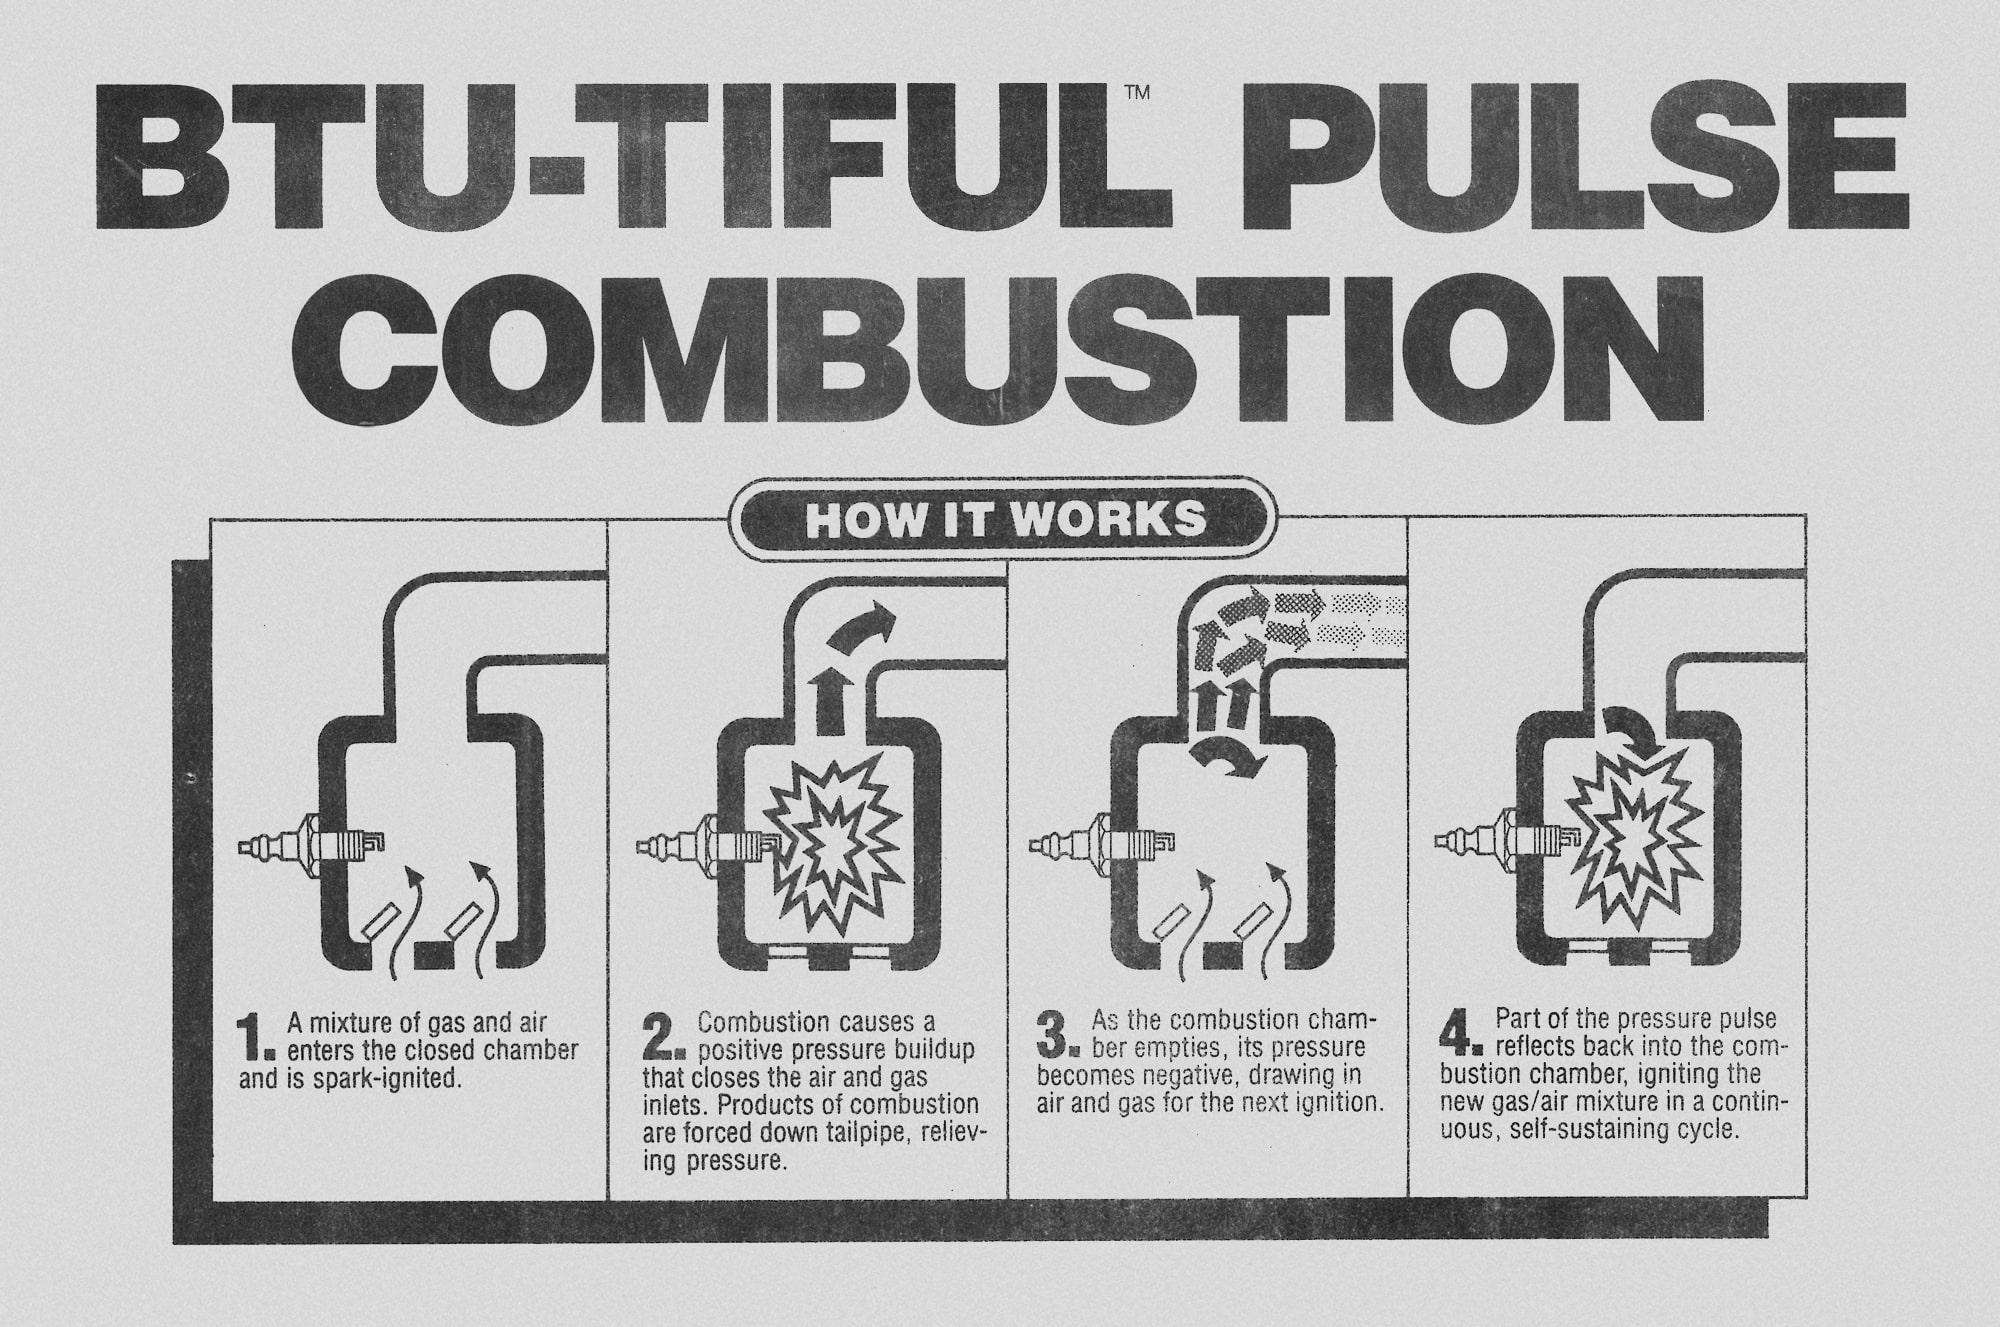 BTU-tiful Pulse